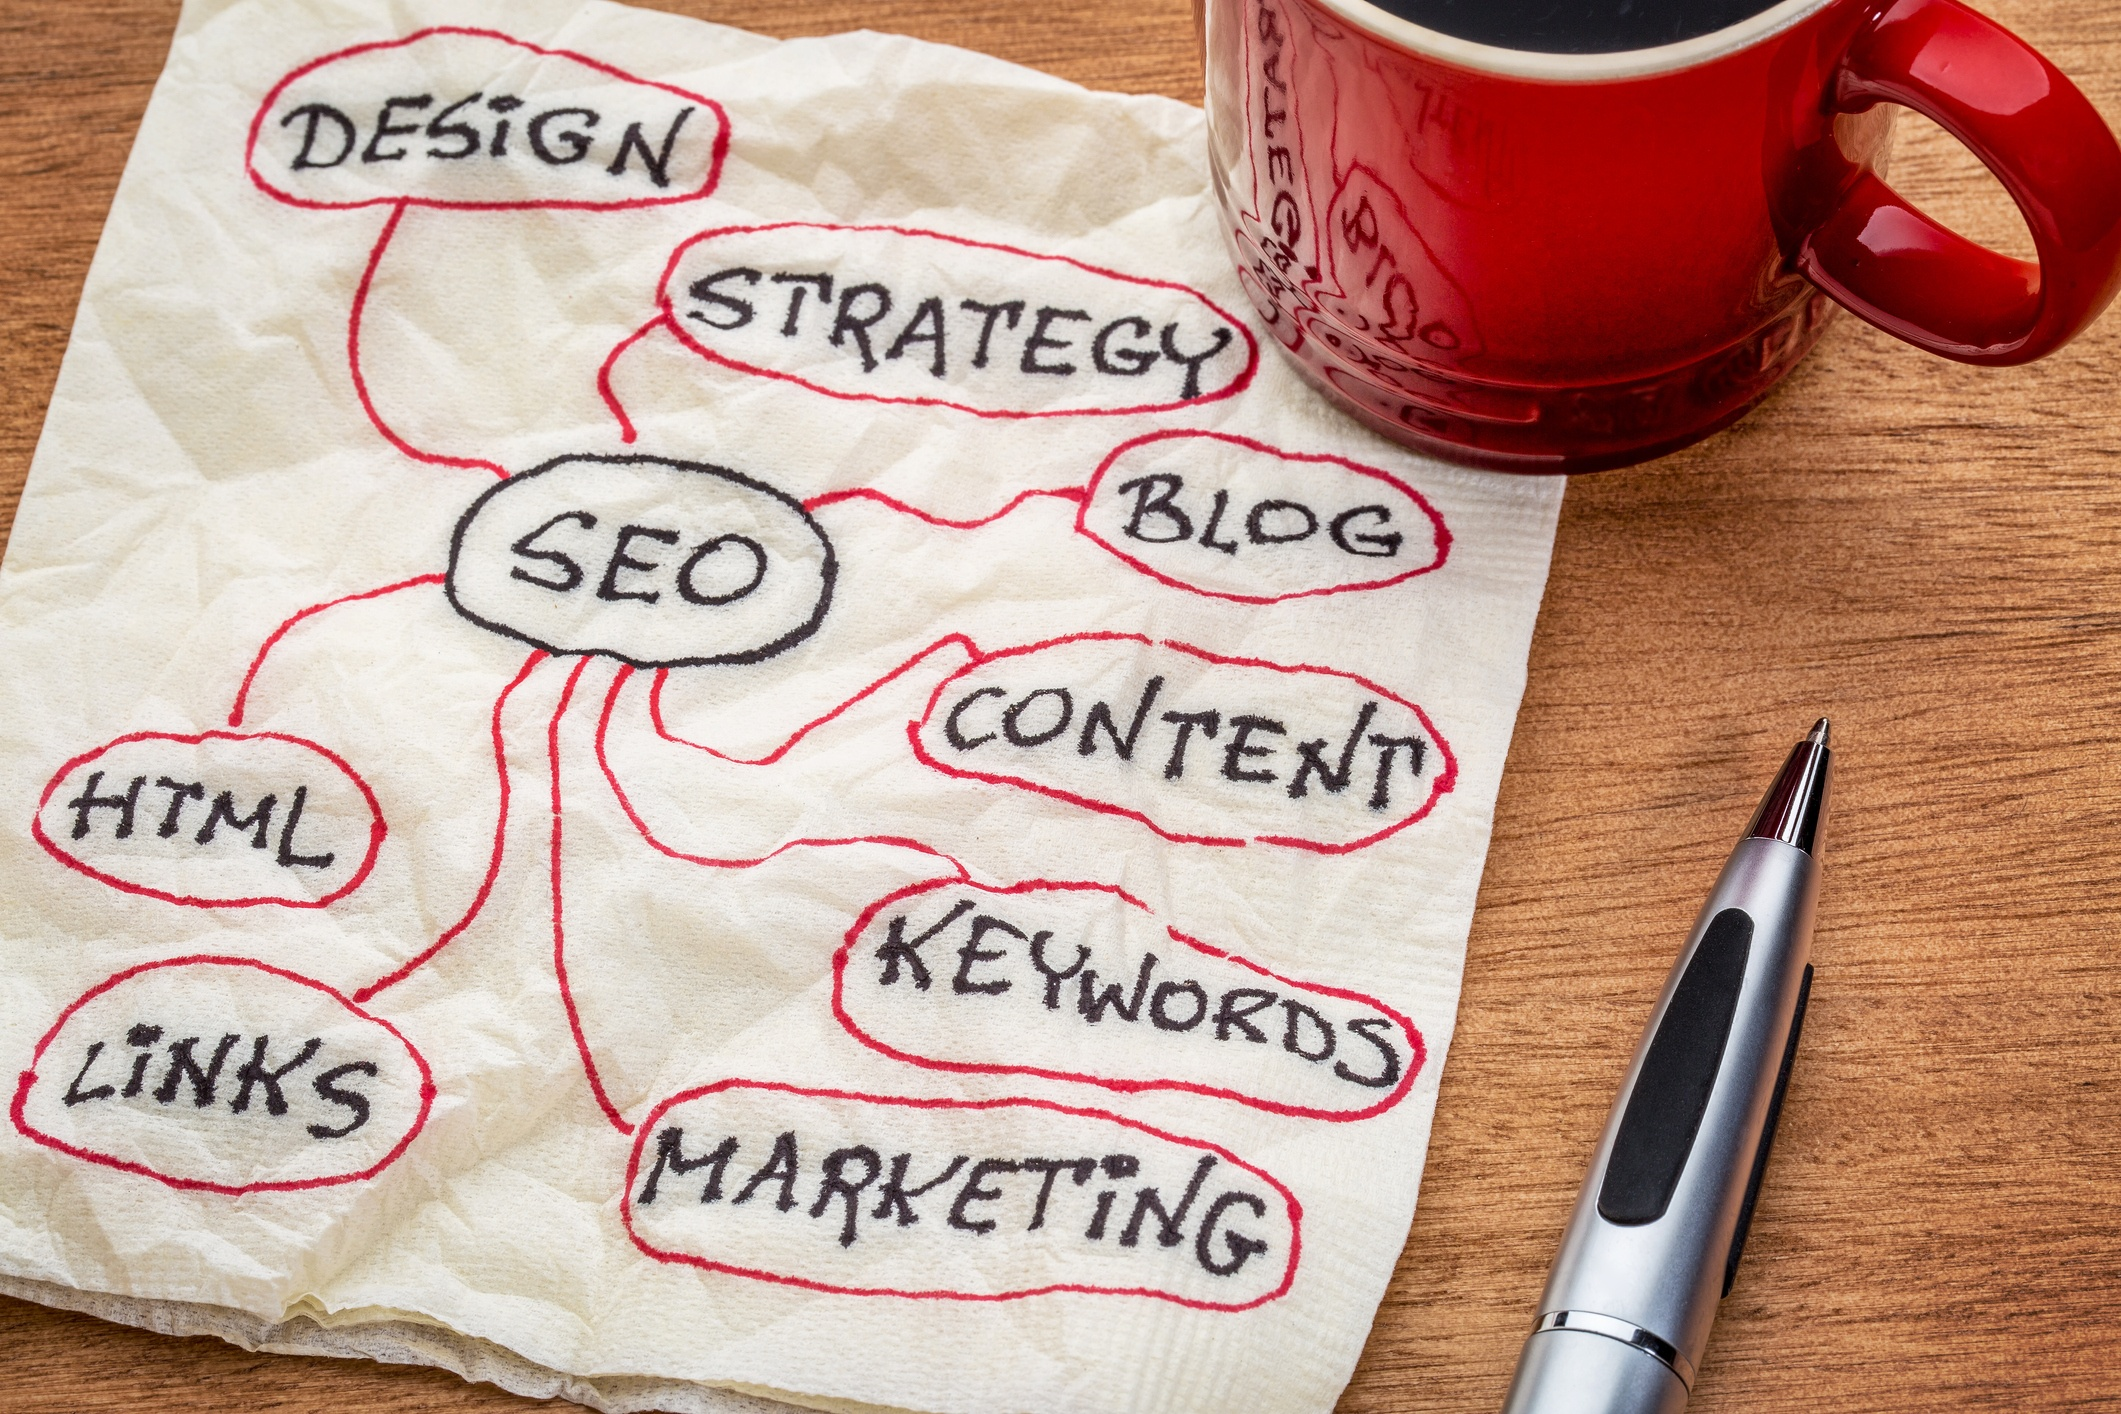 7-ways-SEO-can-help-grow-your-business.jpg